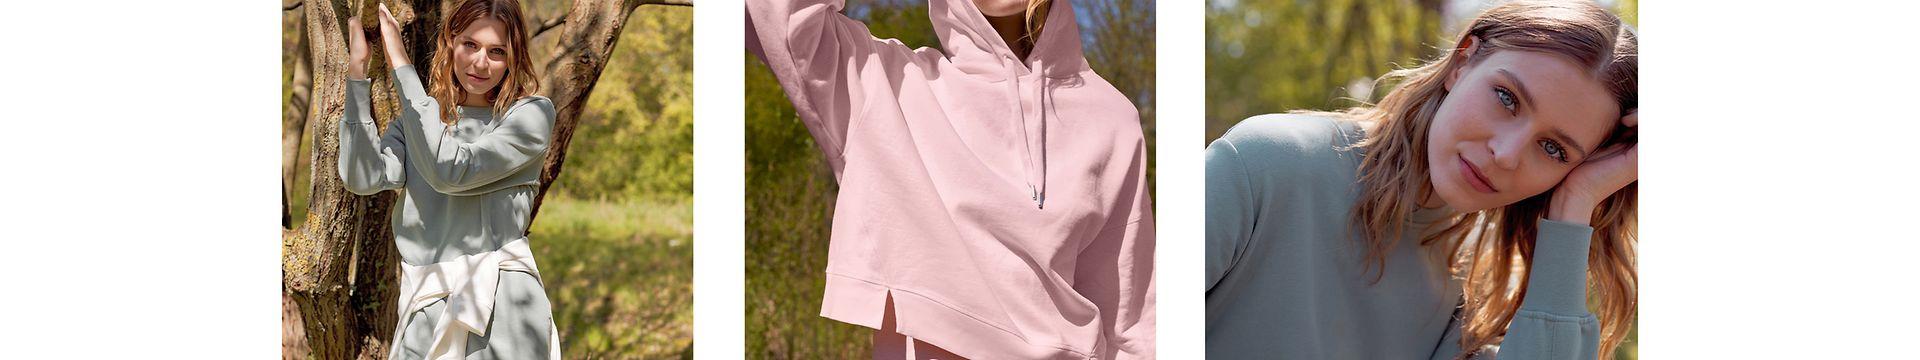 202020 - Women - tc banner - loungewear - IMG